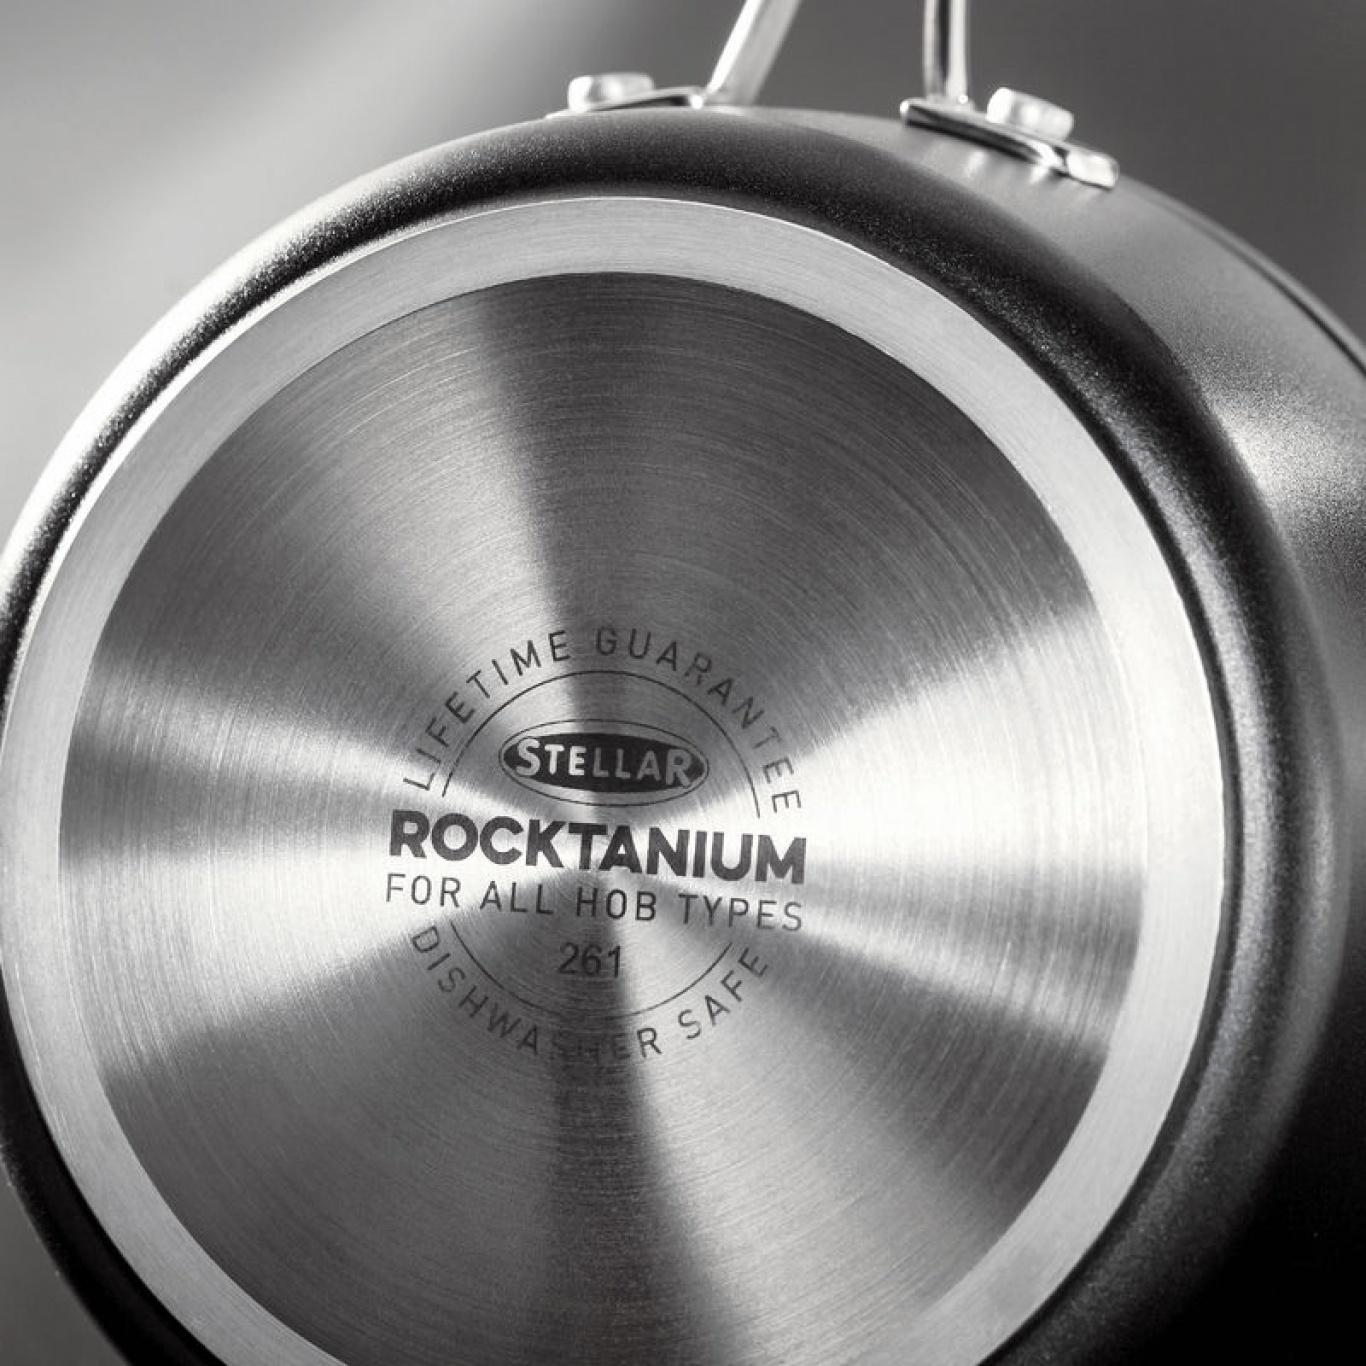 Stellar Rocktanium 16cm Saucepan